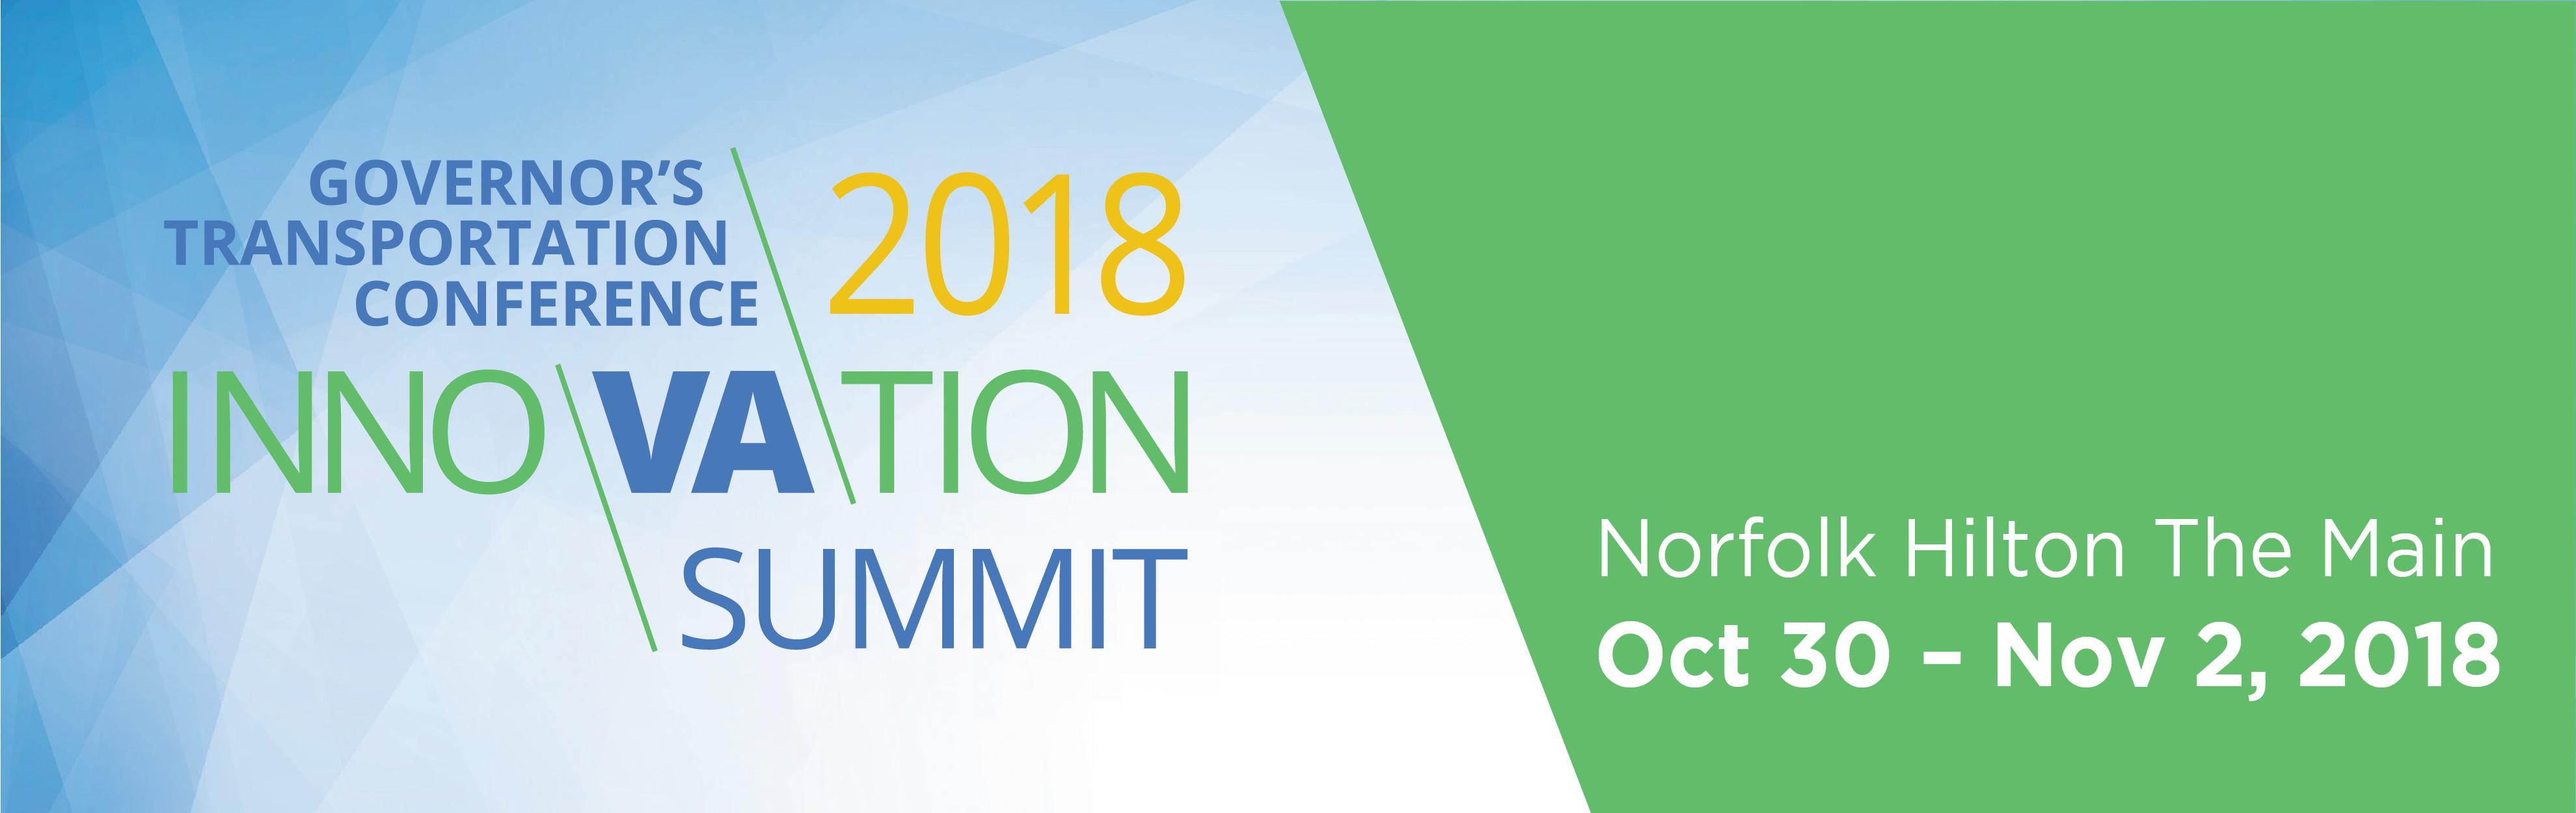 Governor's Transportation Conference/2018 Innovation Summit